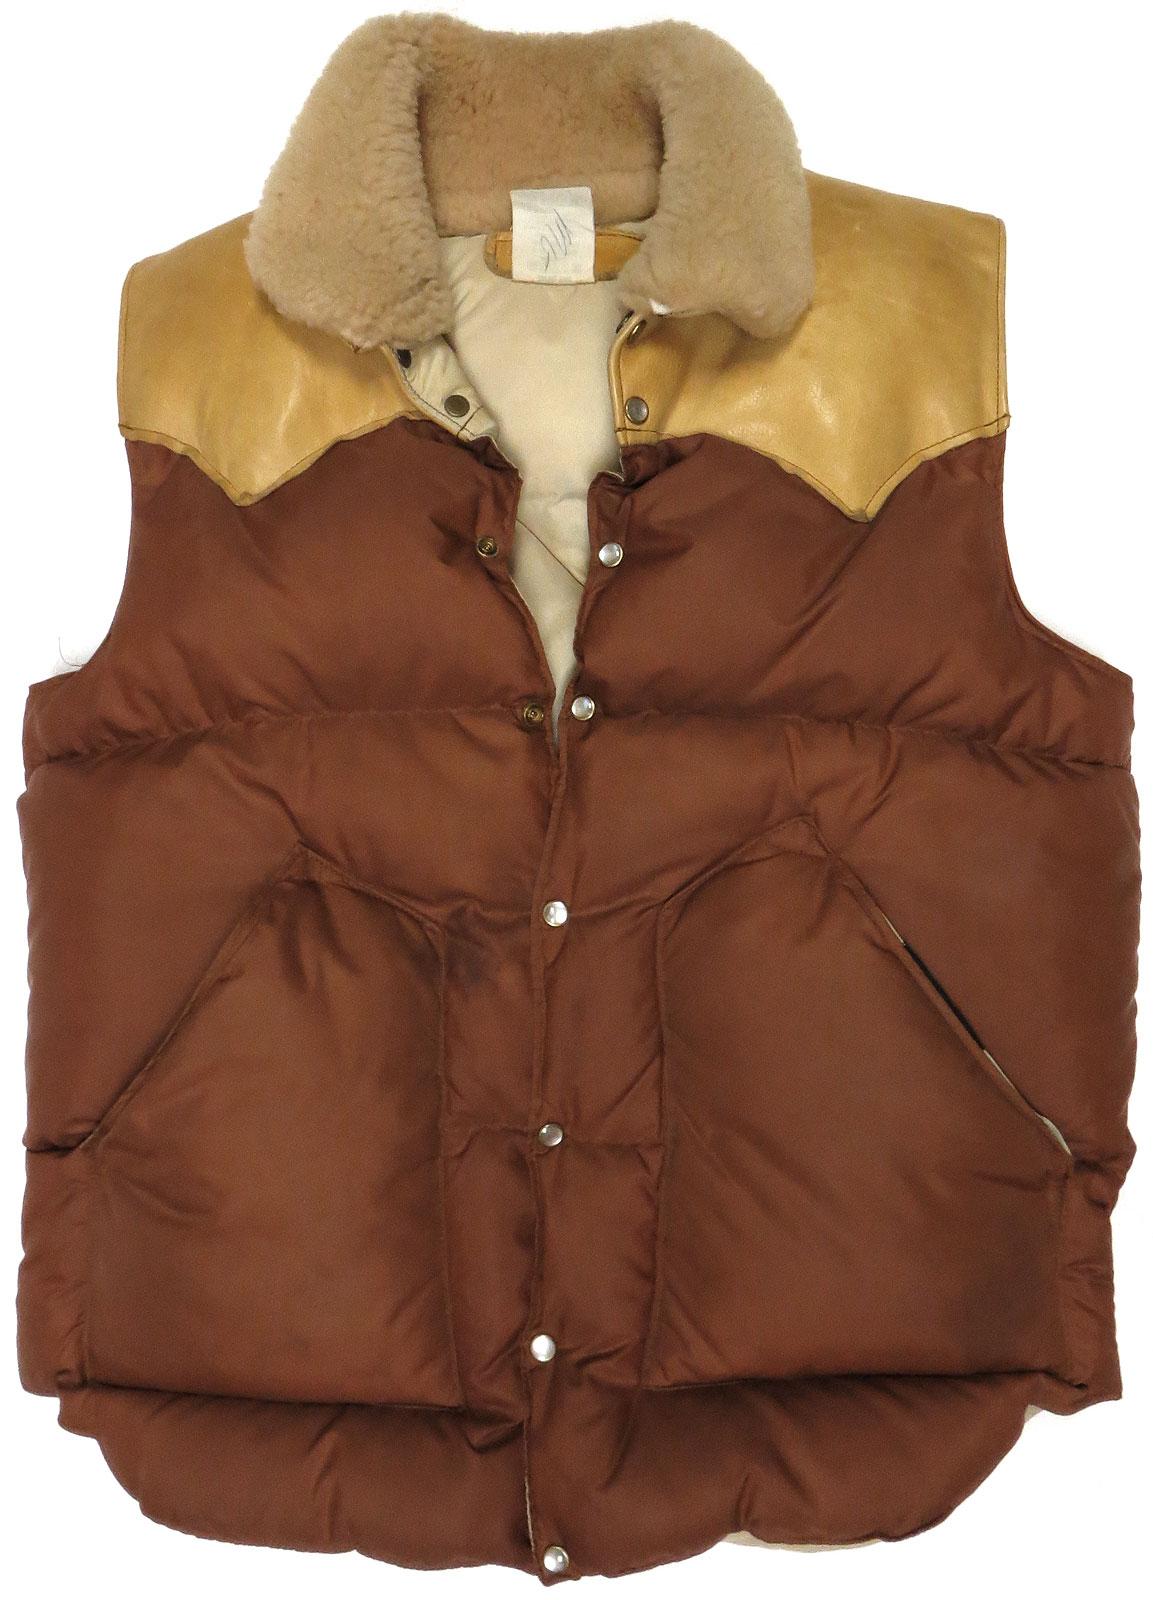 RMF Vintage Down Vest